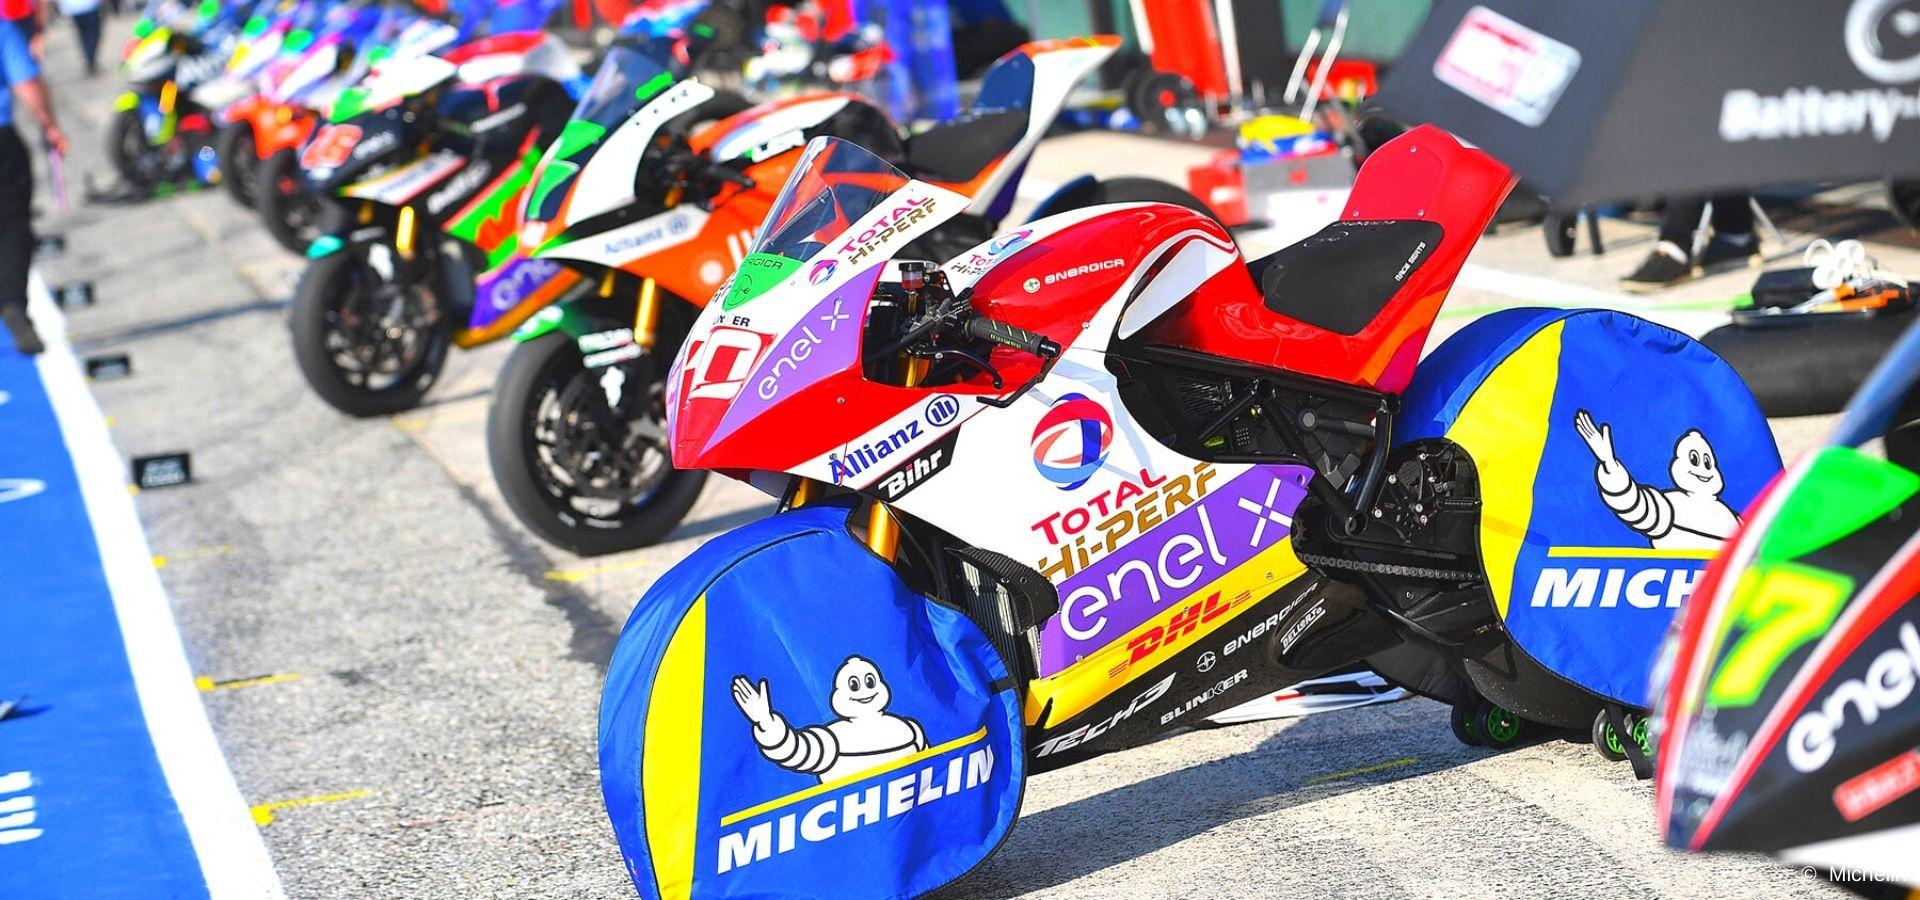 Nicolas Goubert: the overview of the MotoE 2020 - part 2